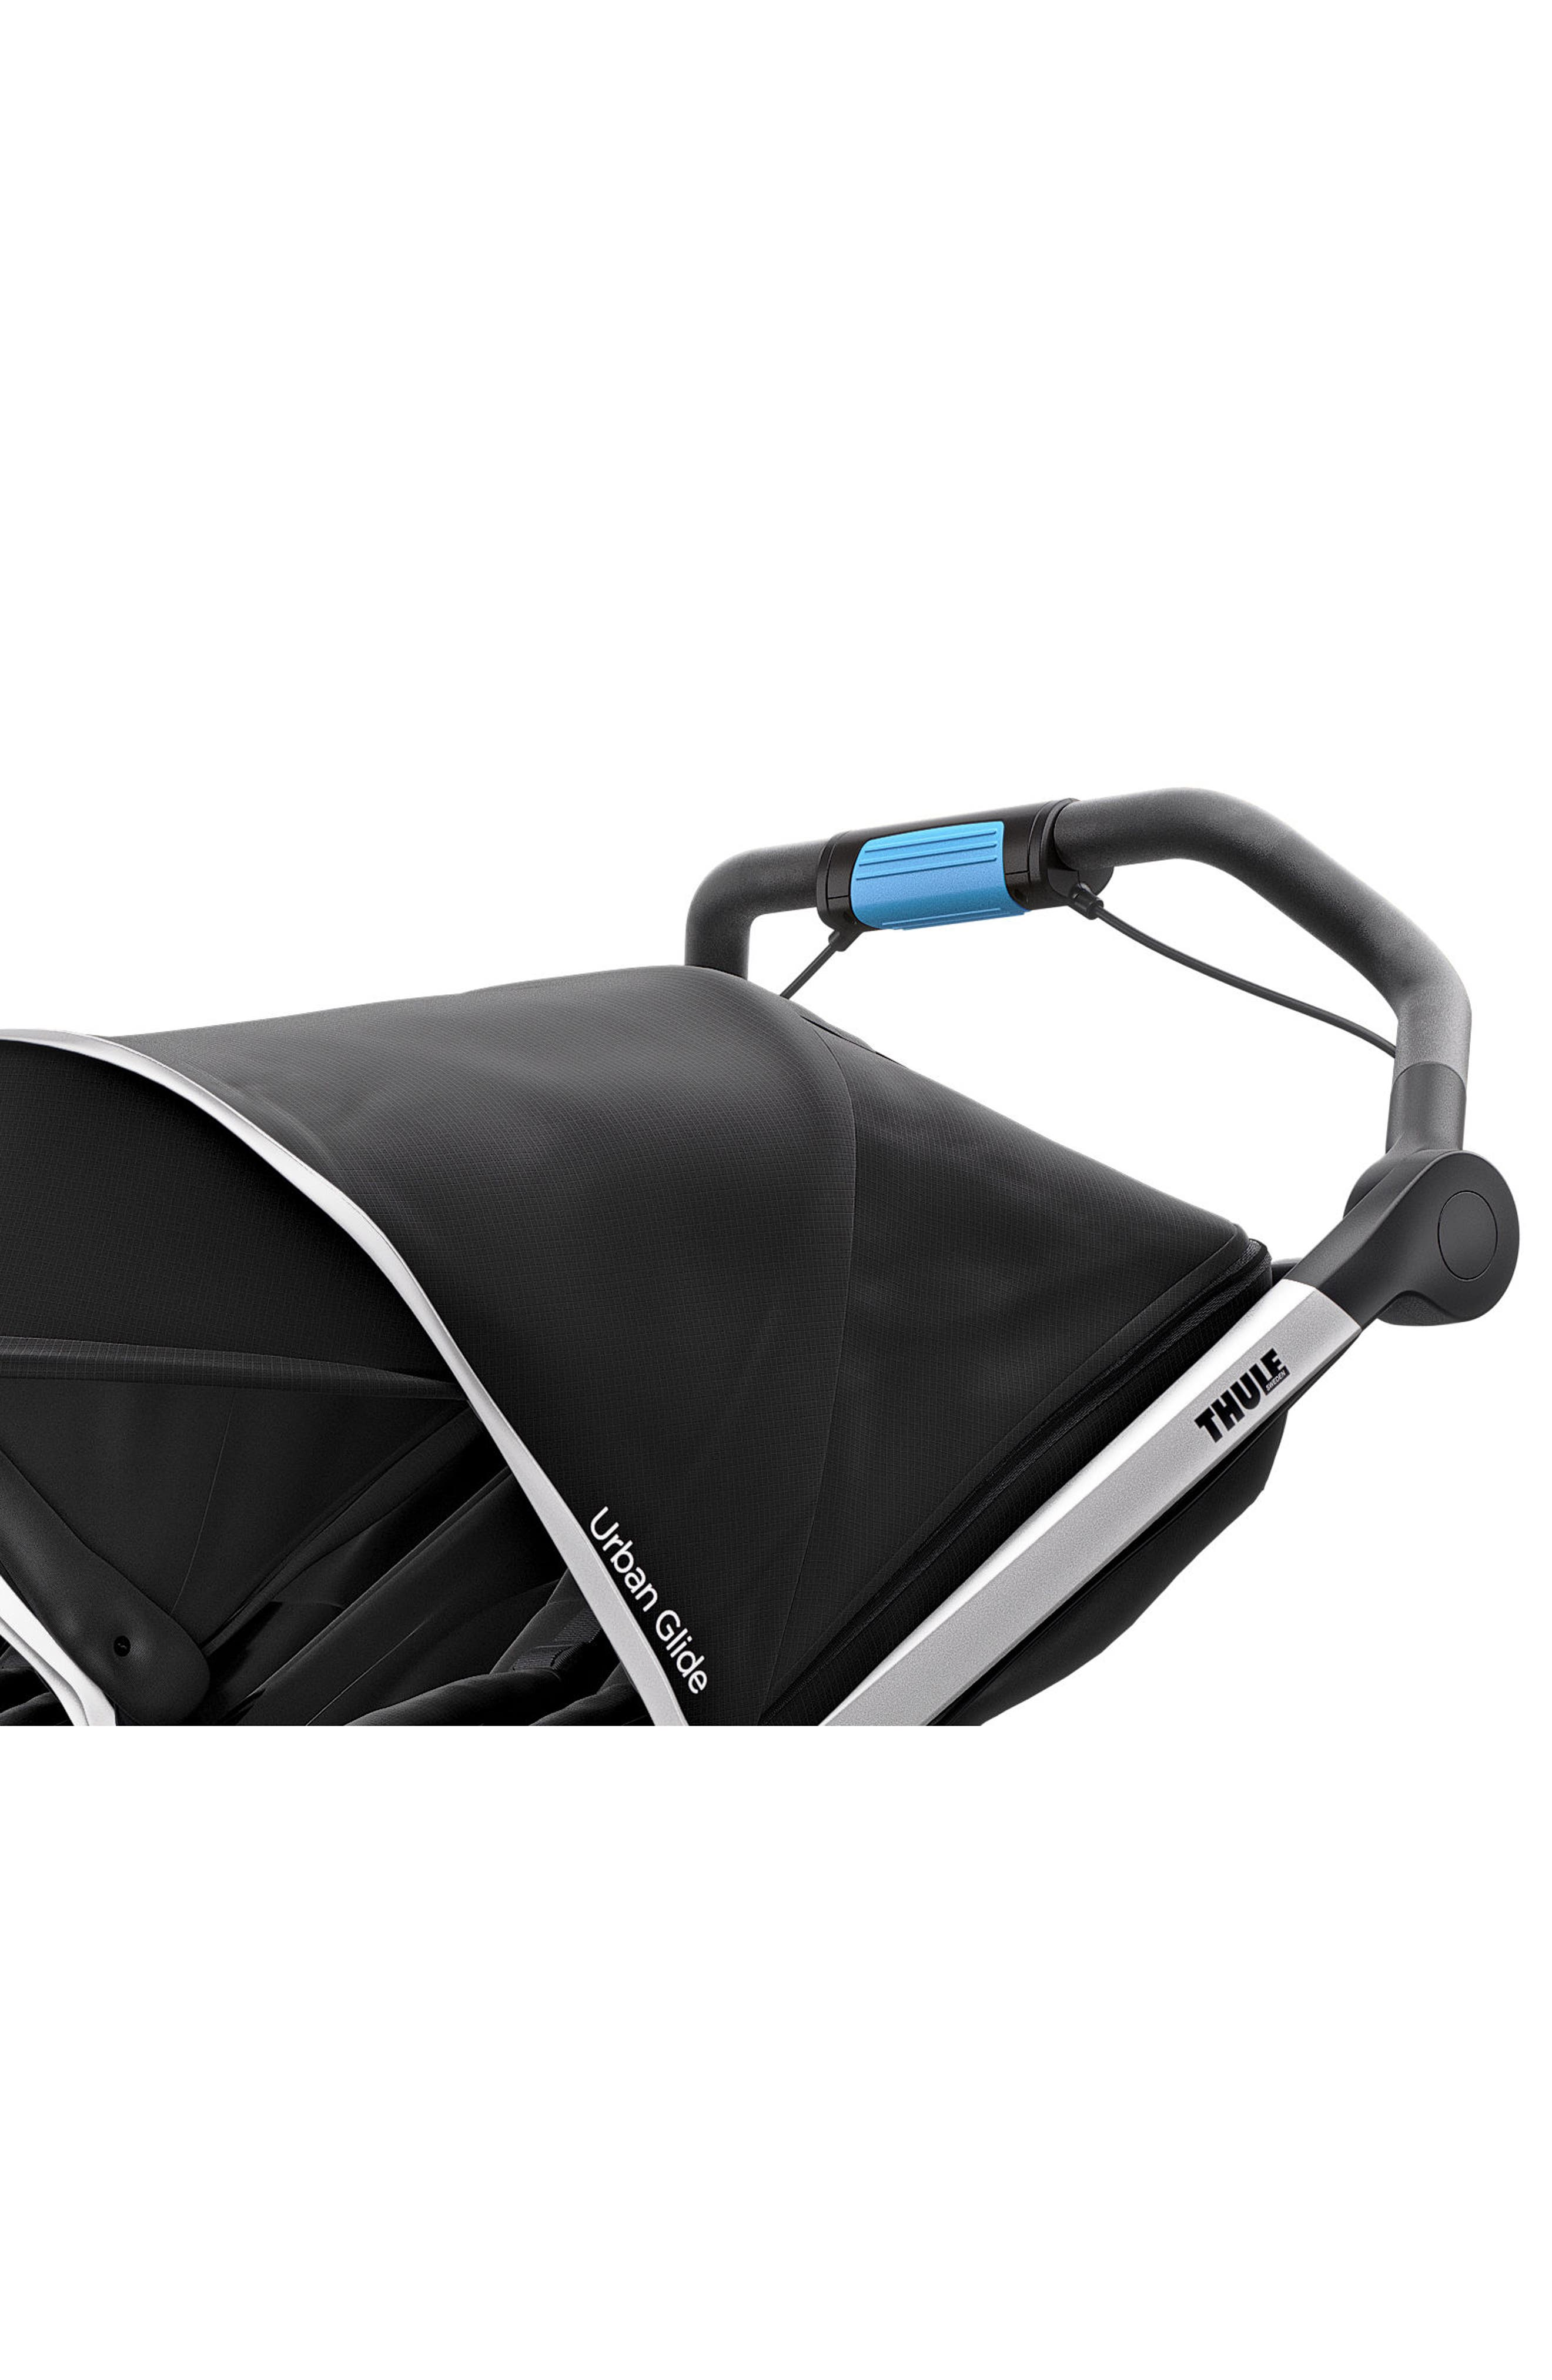 Urban Glide 2 Double Jogging Stroller,                             Alternate thumbnail 4, color,                             BLACK/ SILVER FRAME